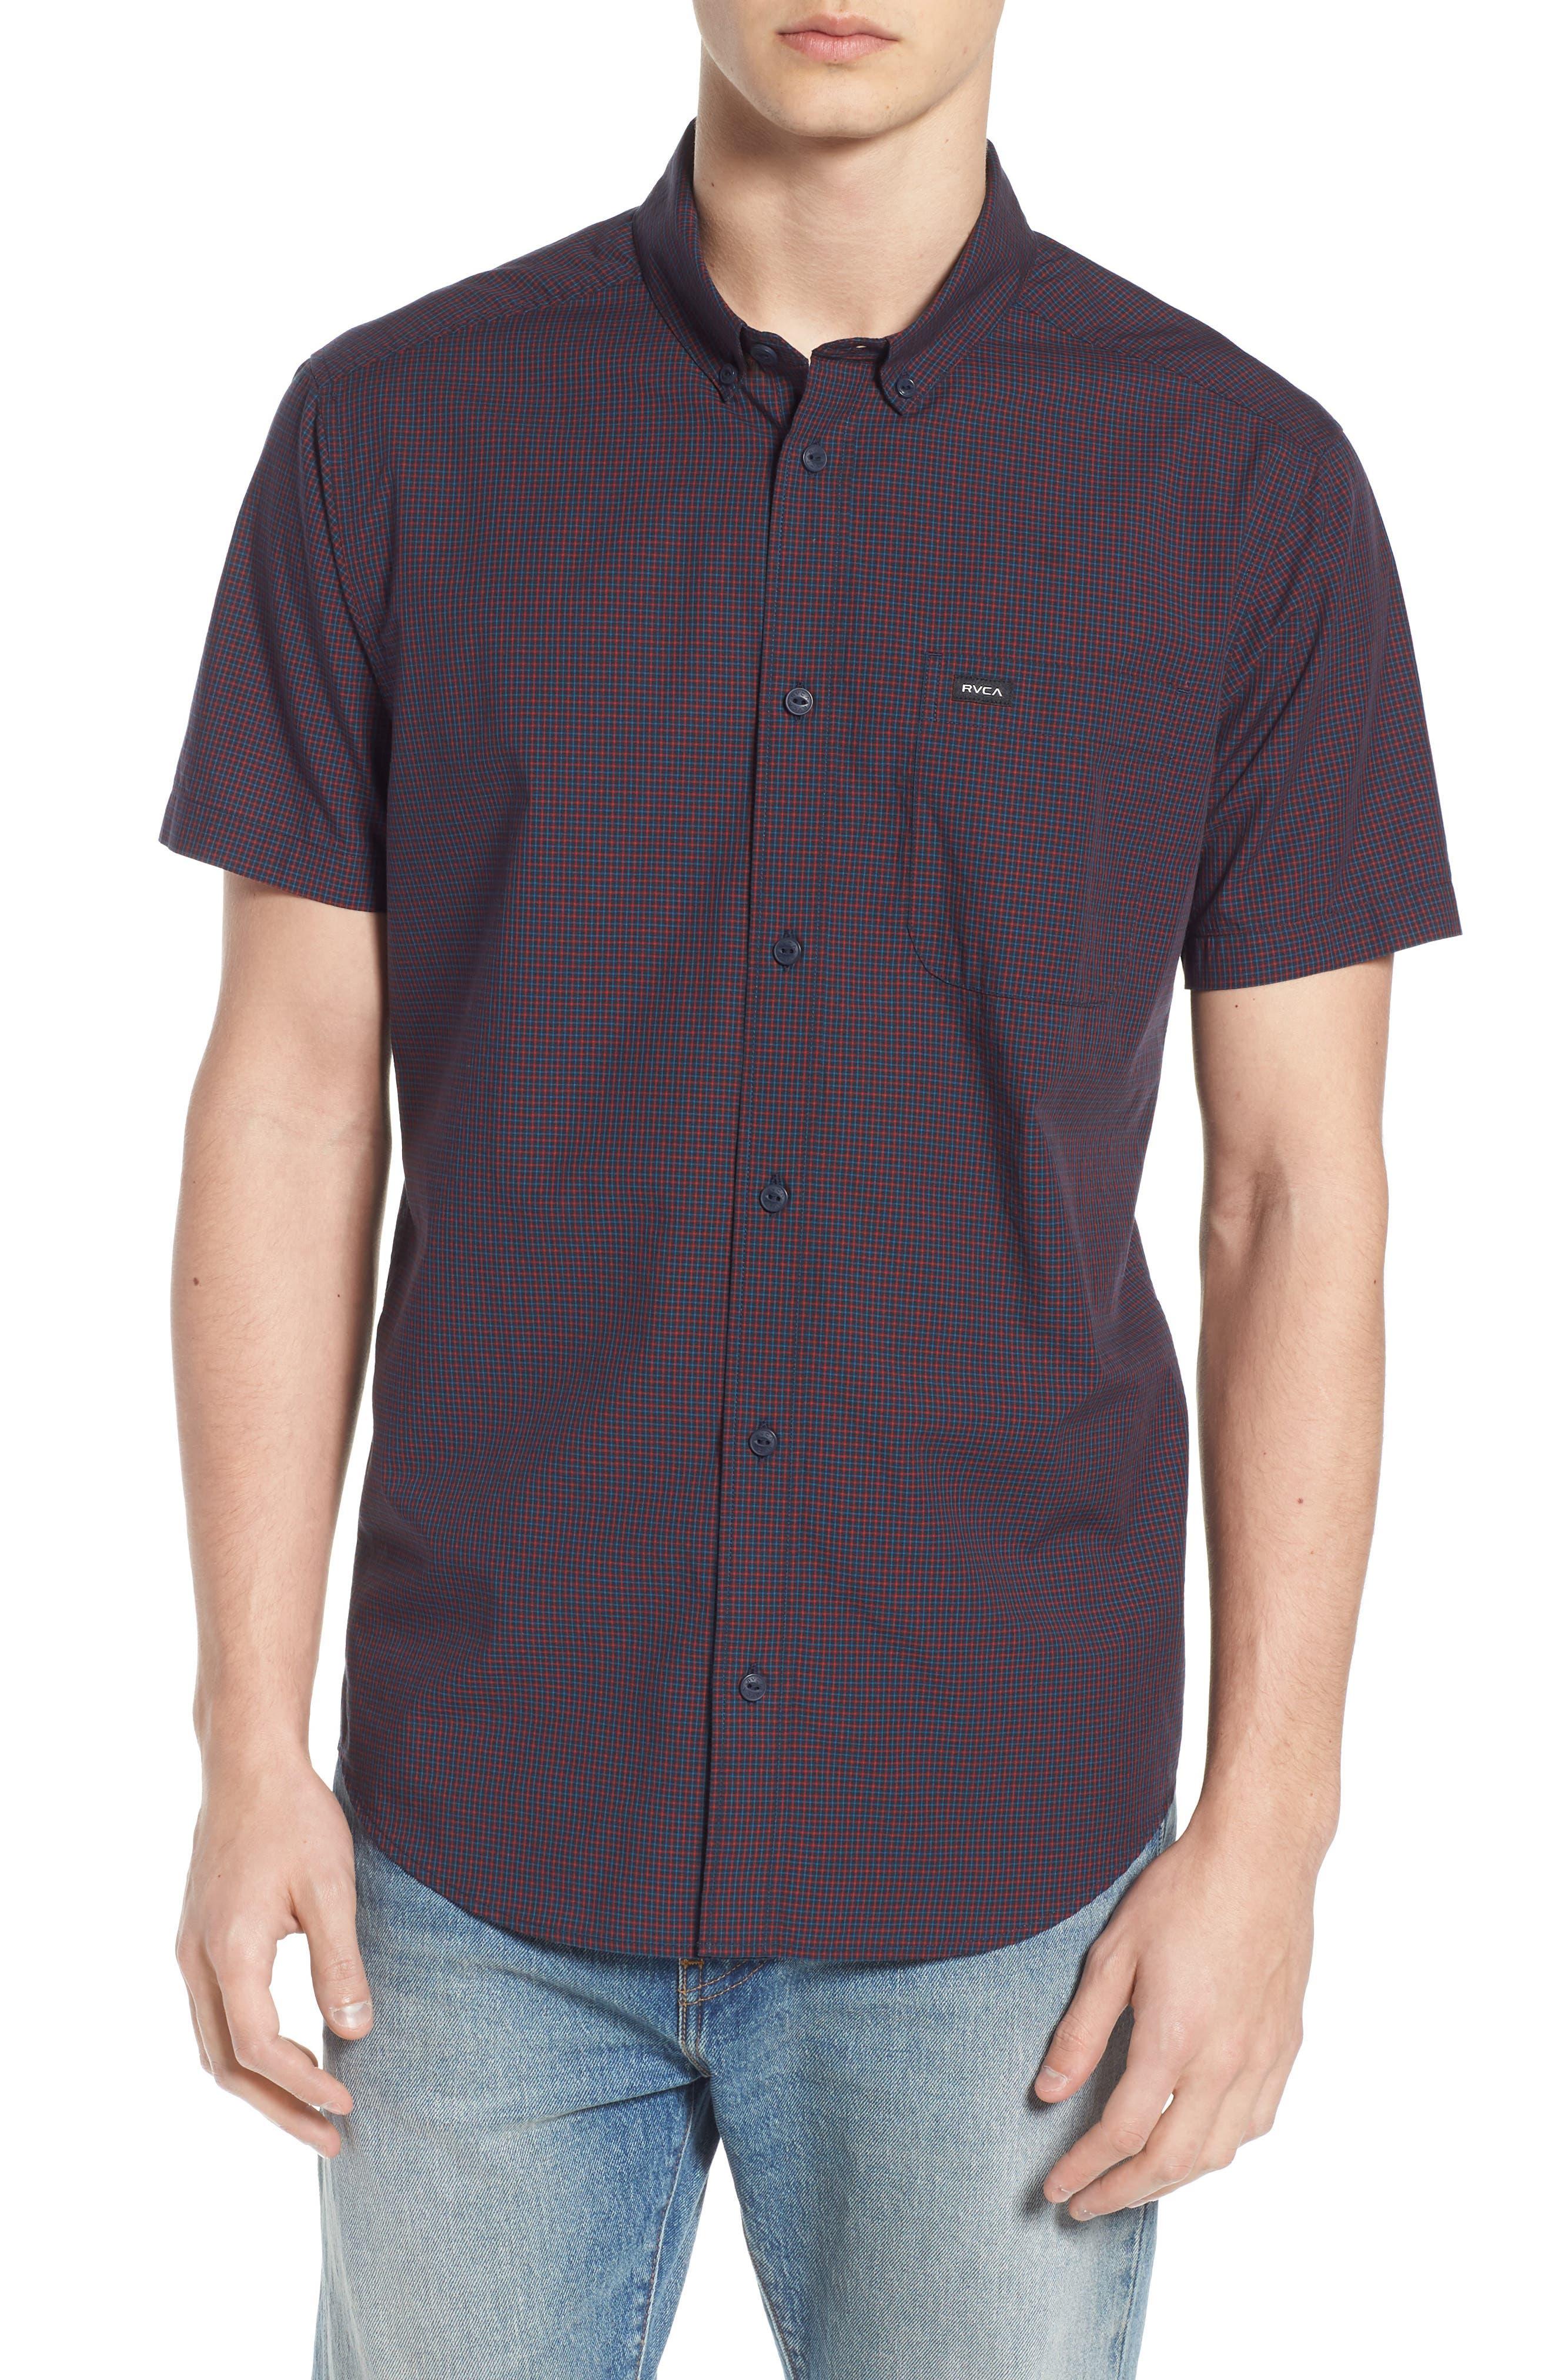 Staple Woven Shirt,                         Main,                         color, NEW NAVY